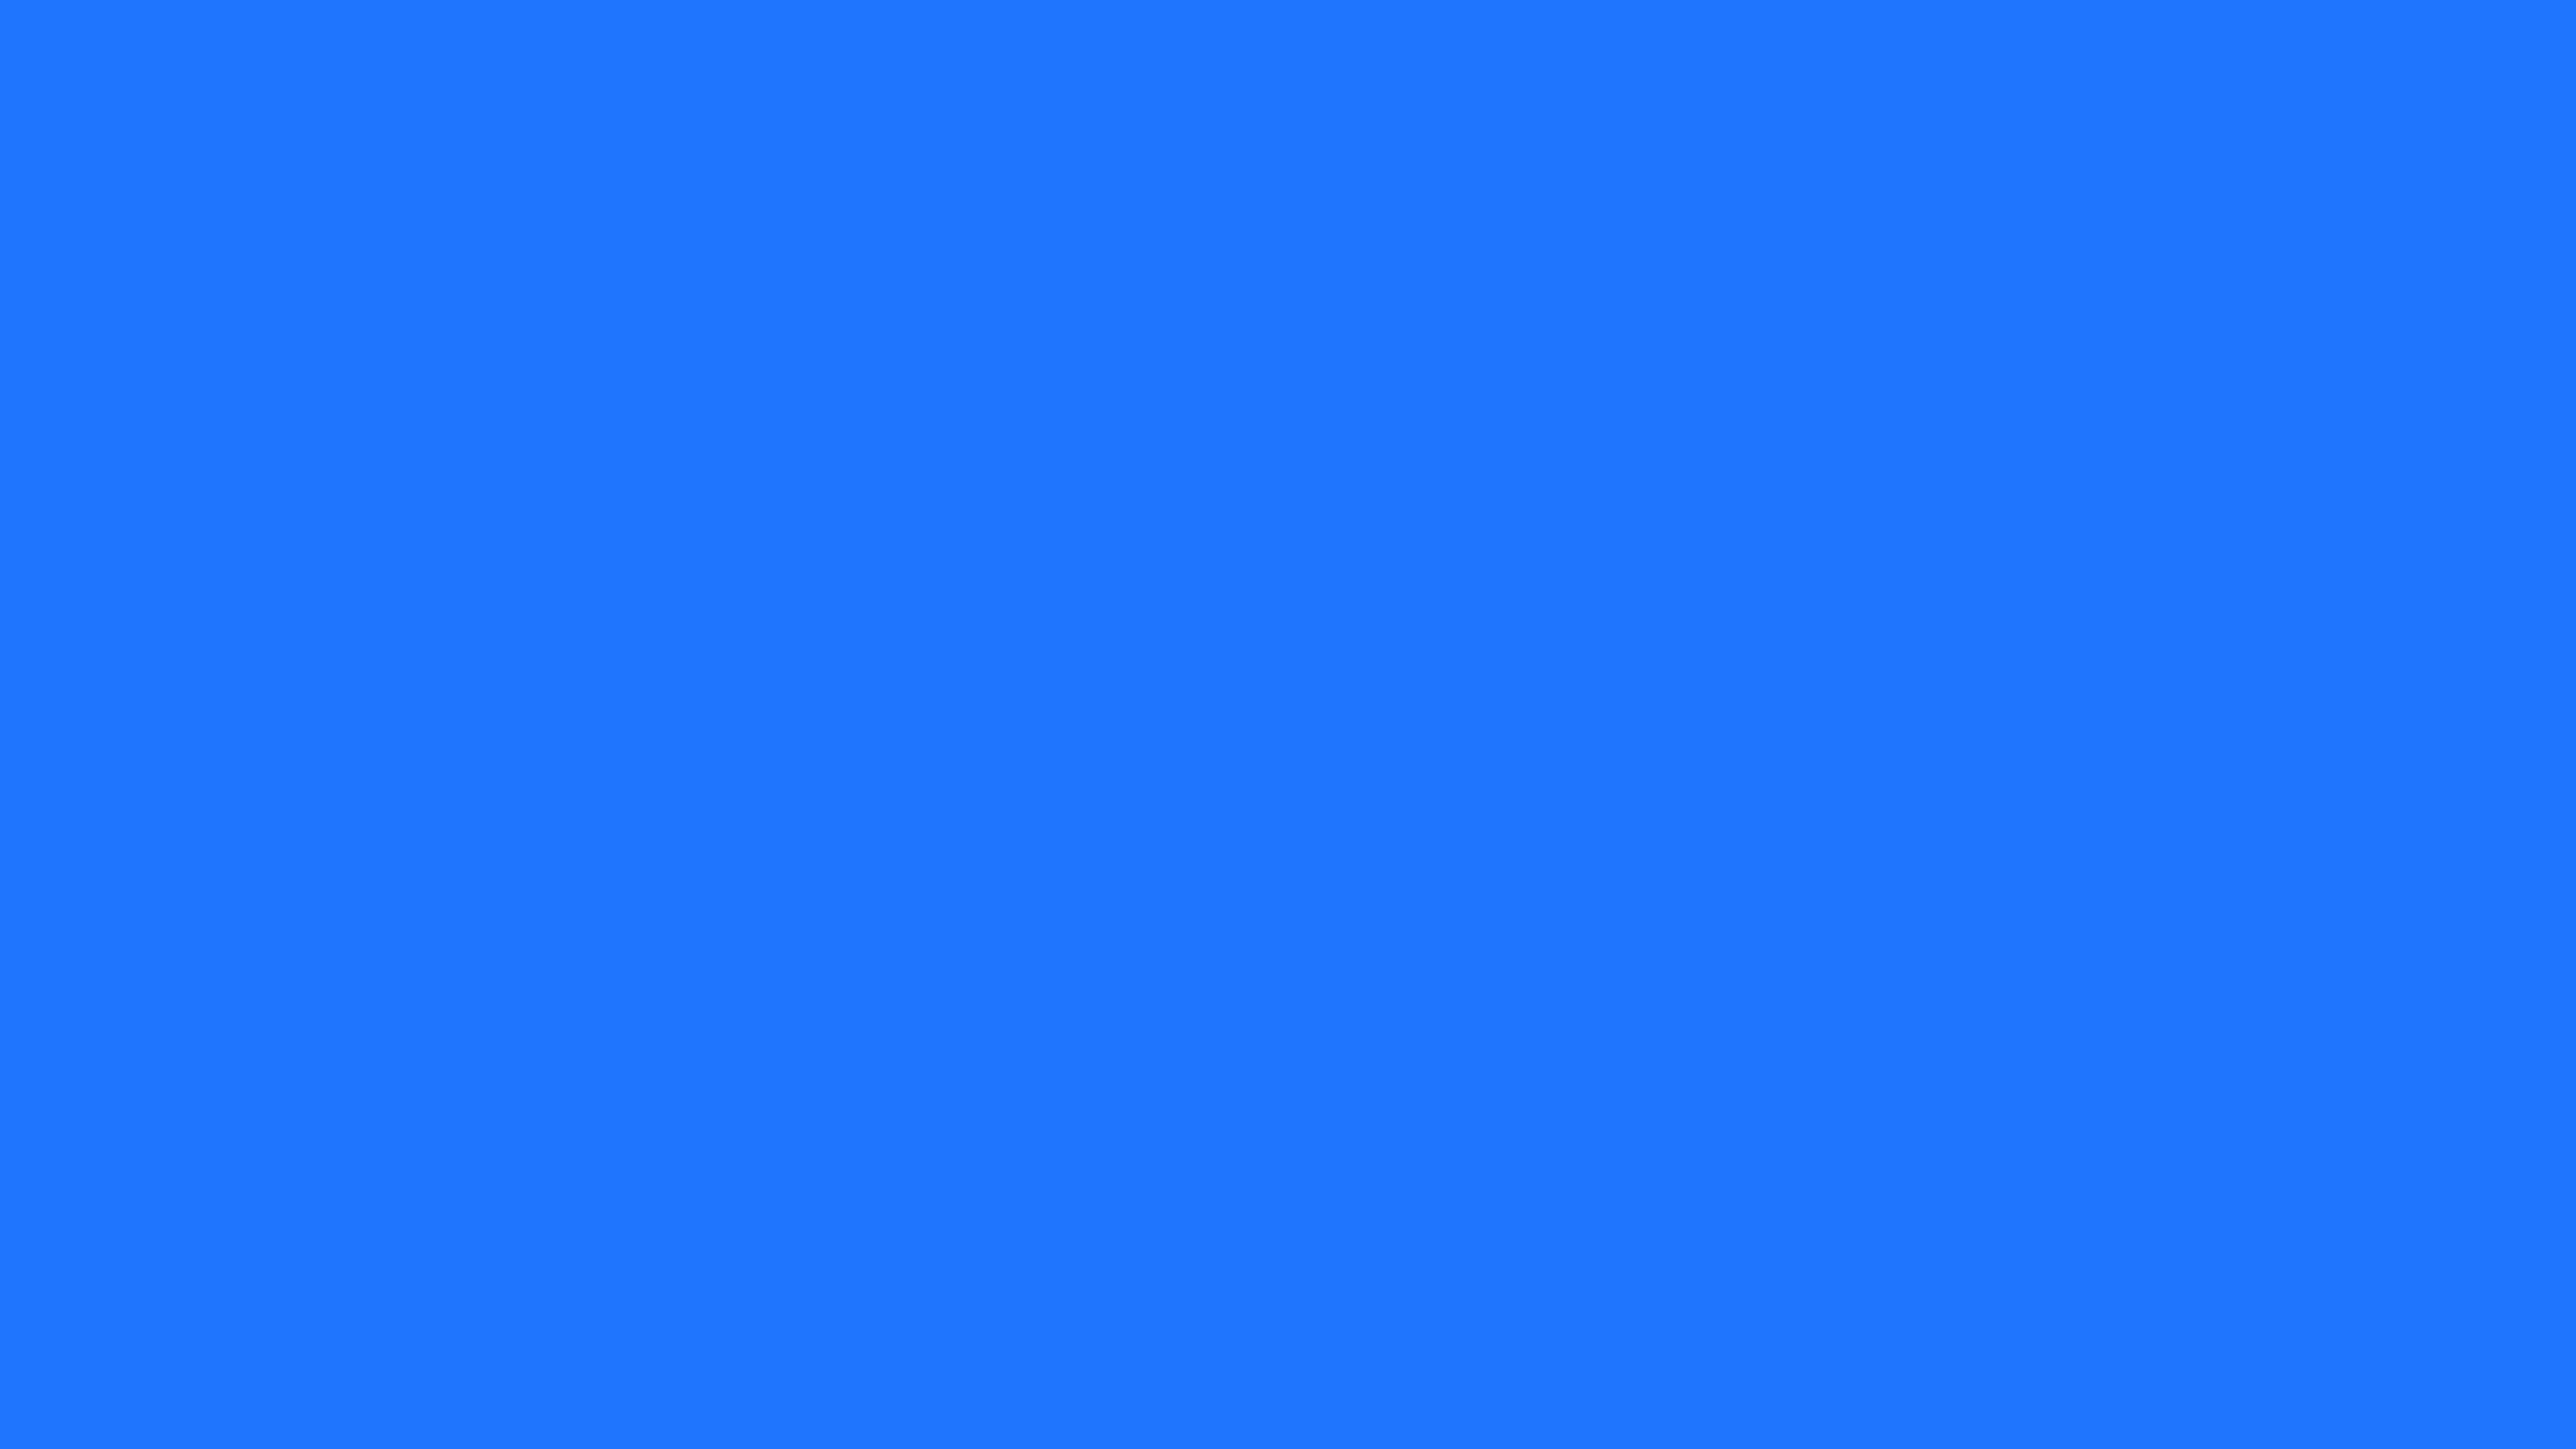 7680x4320 Blue Crayola Solid Color Background